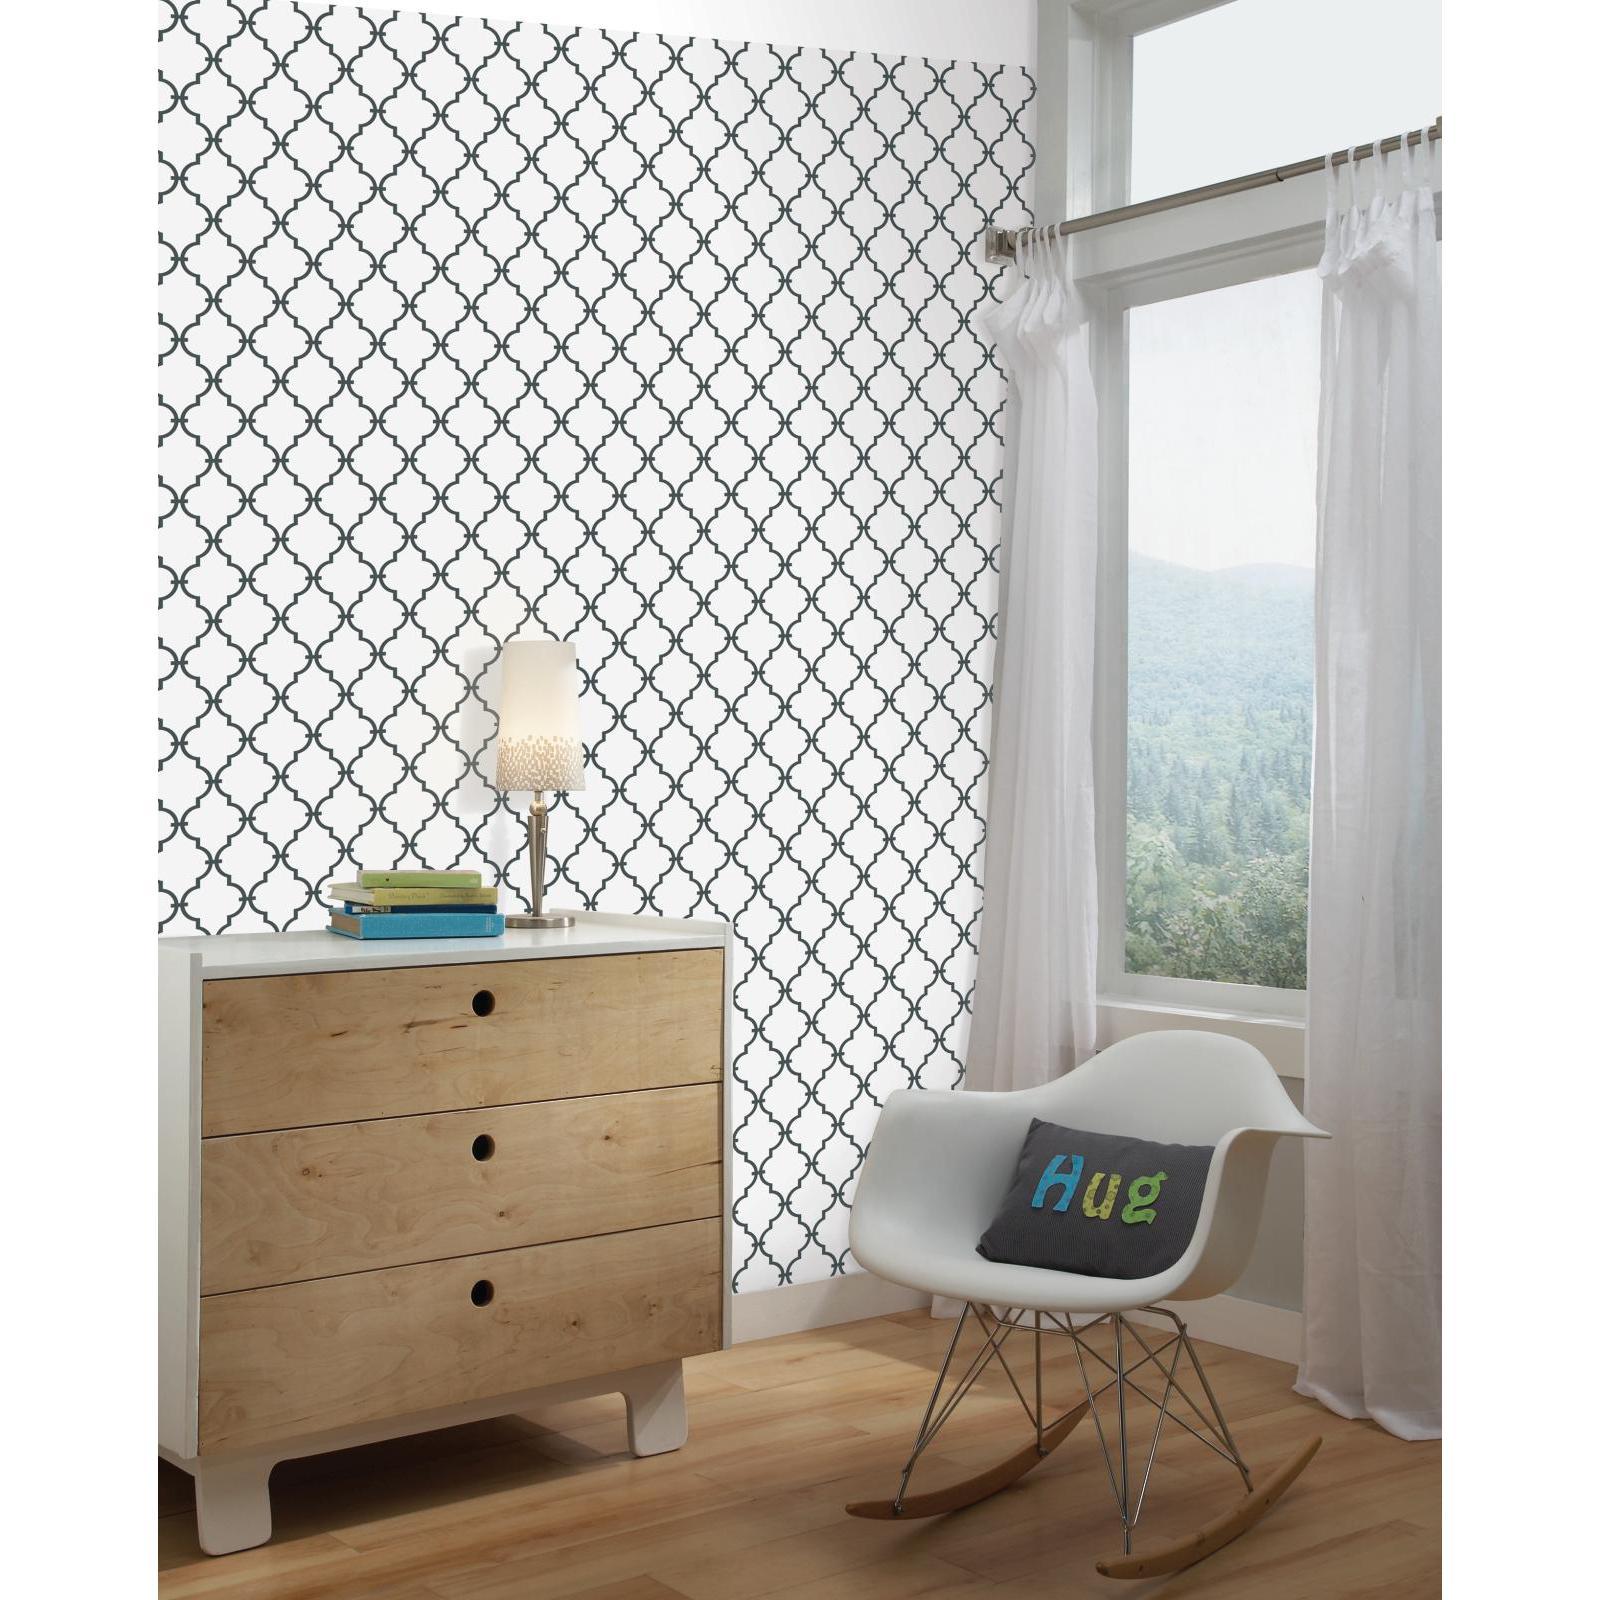 trellis peel and stick wall decor home home decor wall decor. Black Bedroom Furniture Sets. Home Design Ideas